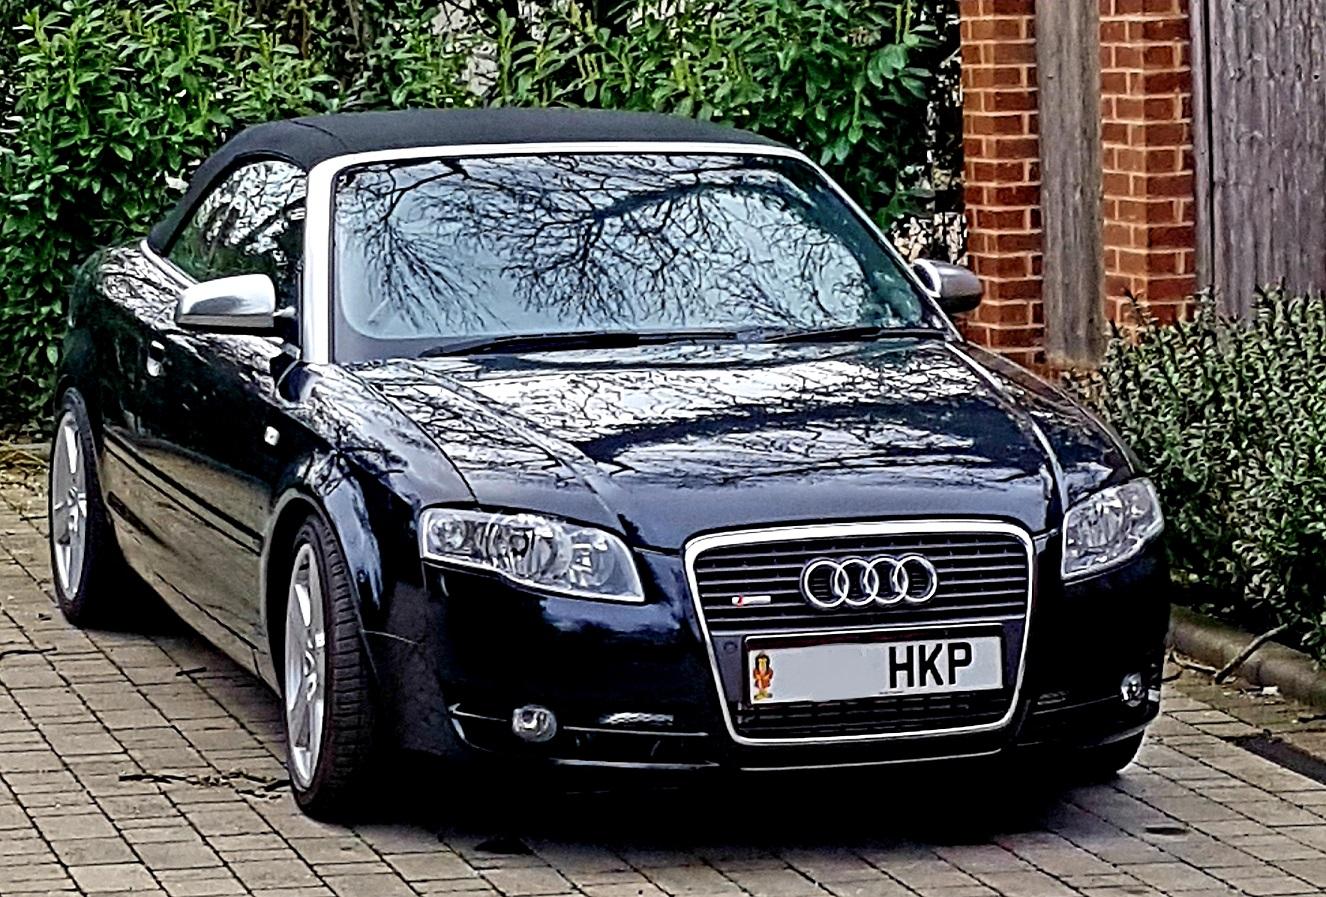 Audi paint job finshed.jpg